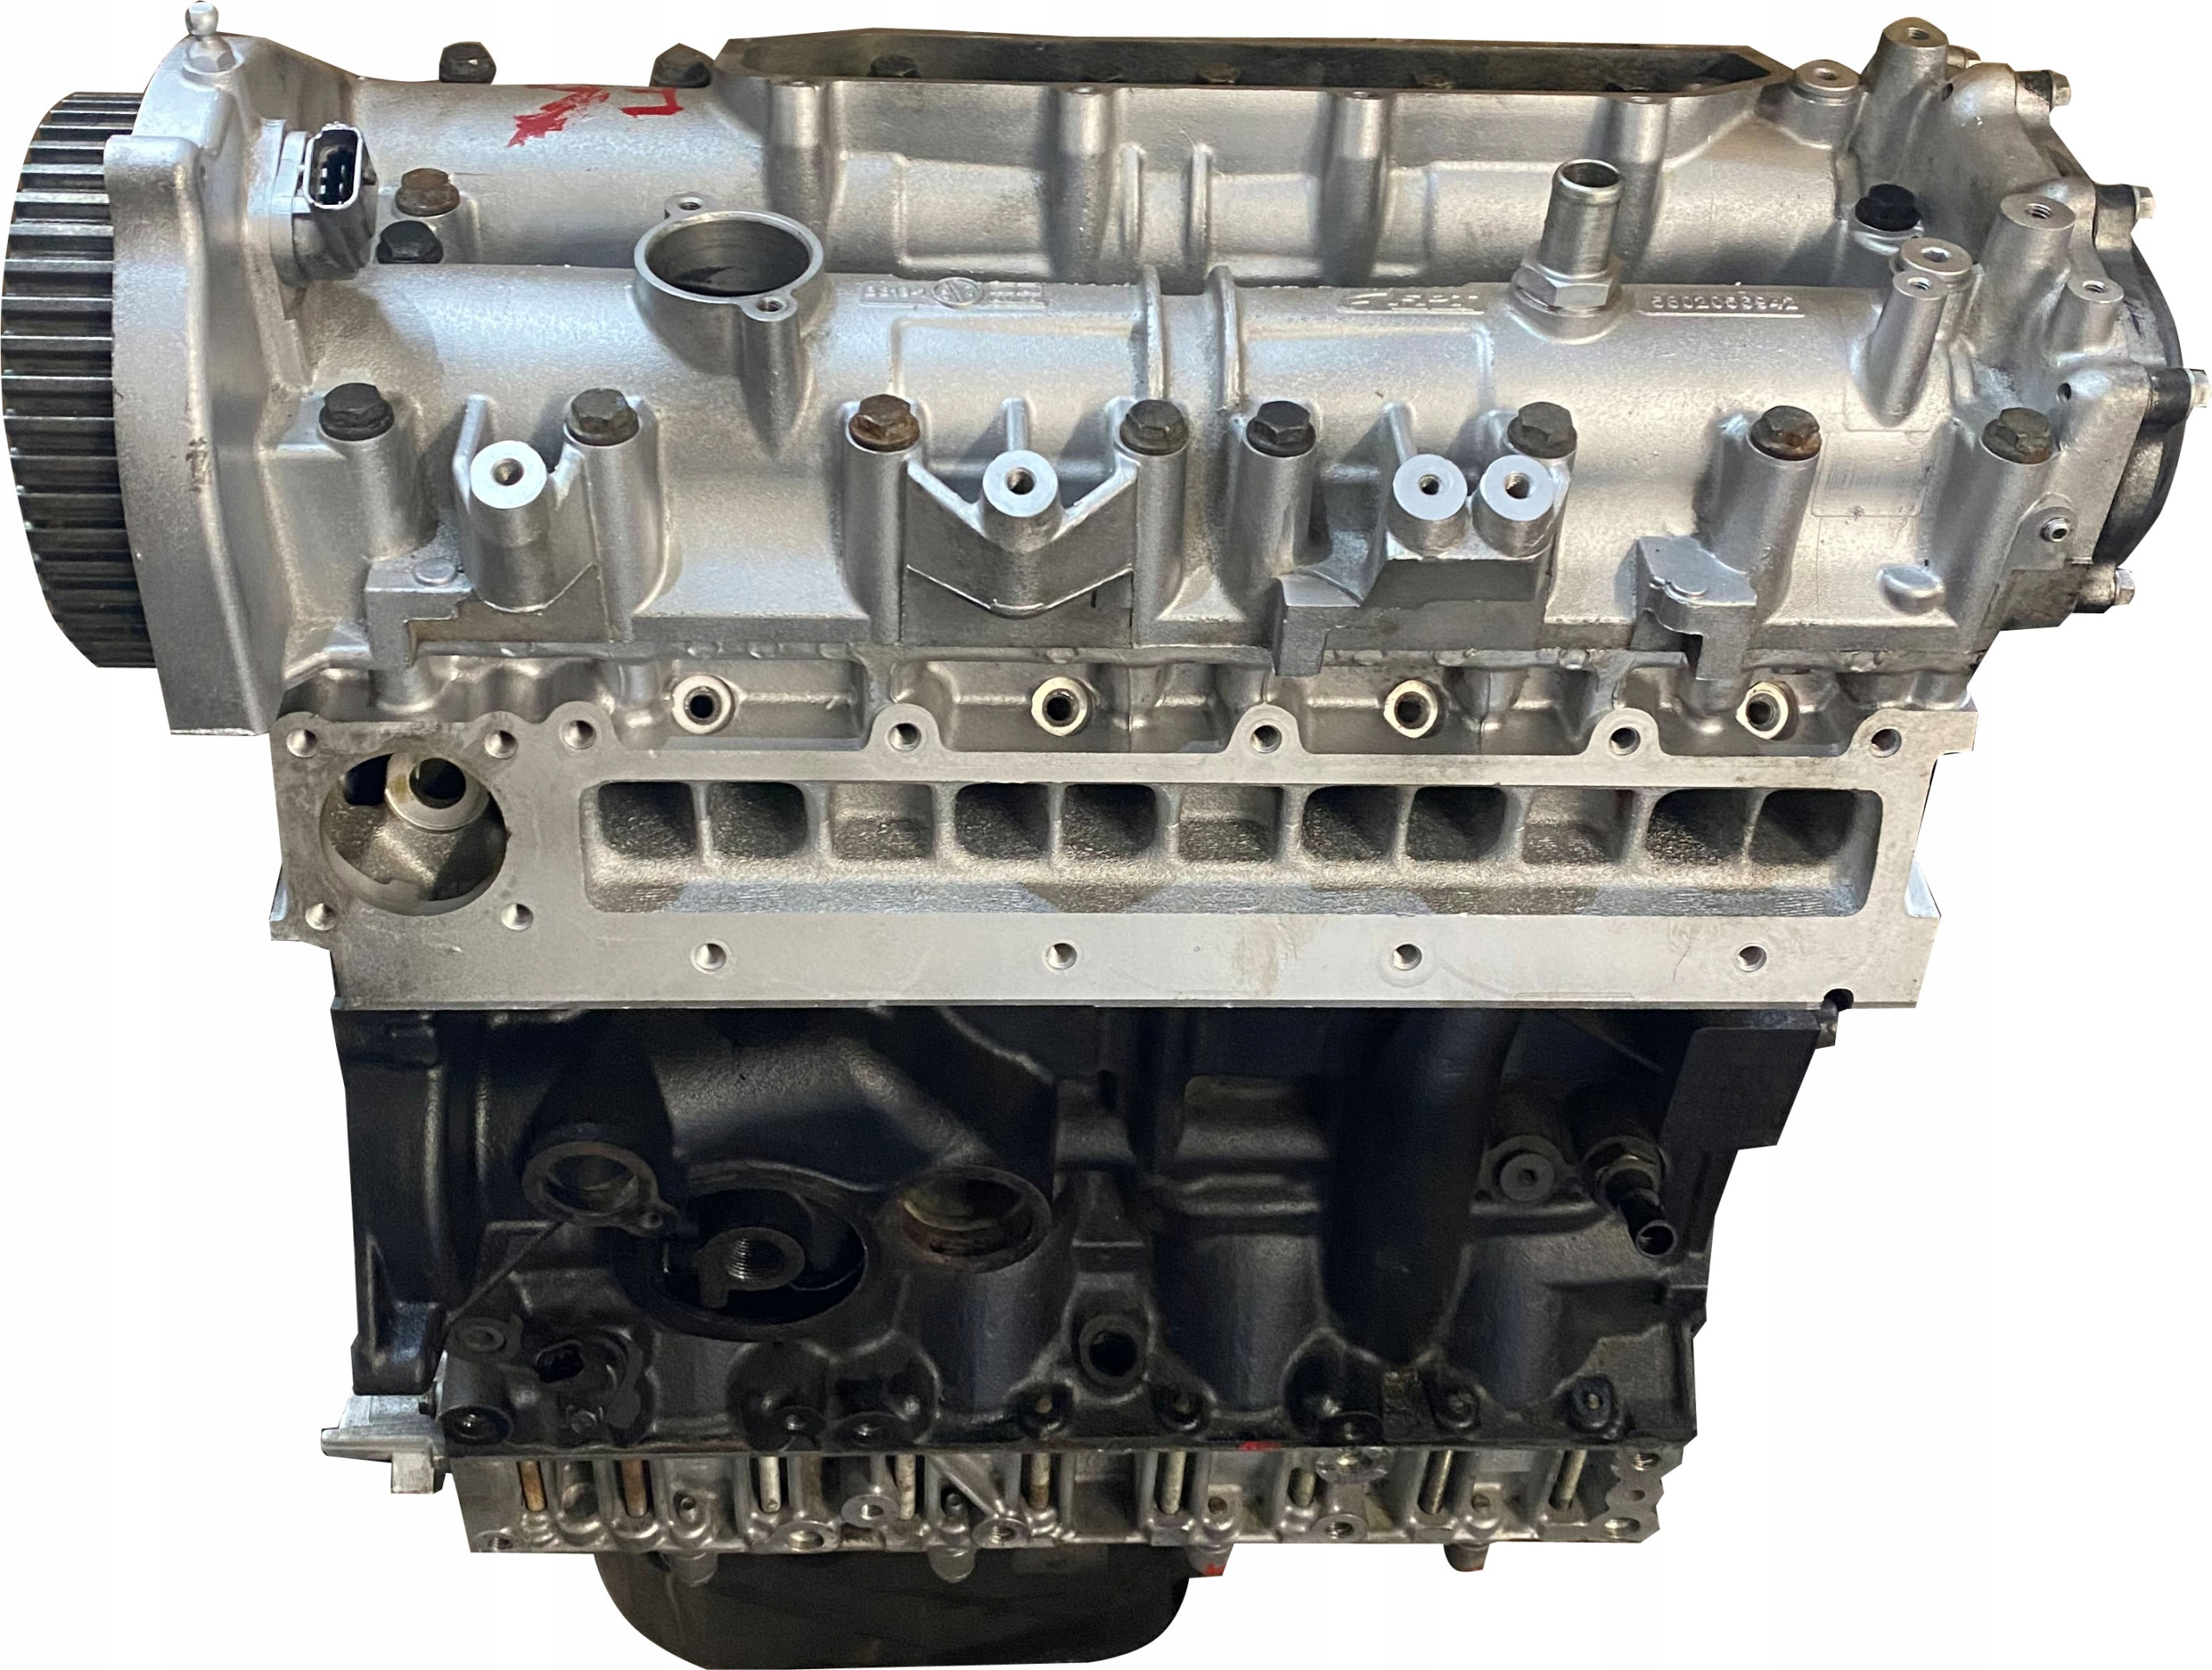 Iveco fiat ducato 2.3 jtd euro 6 двигатель 2014-2020, фото 0